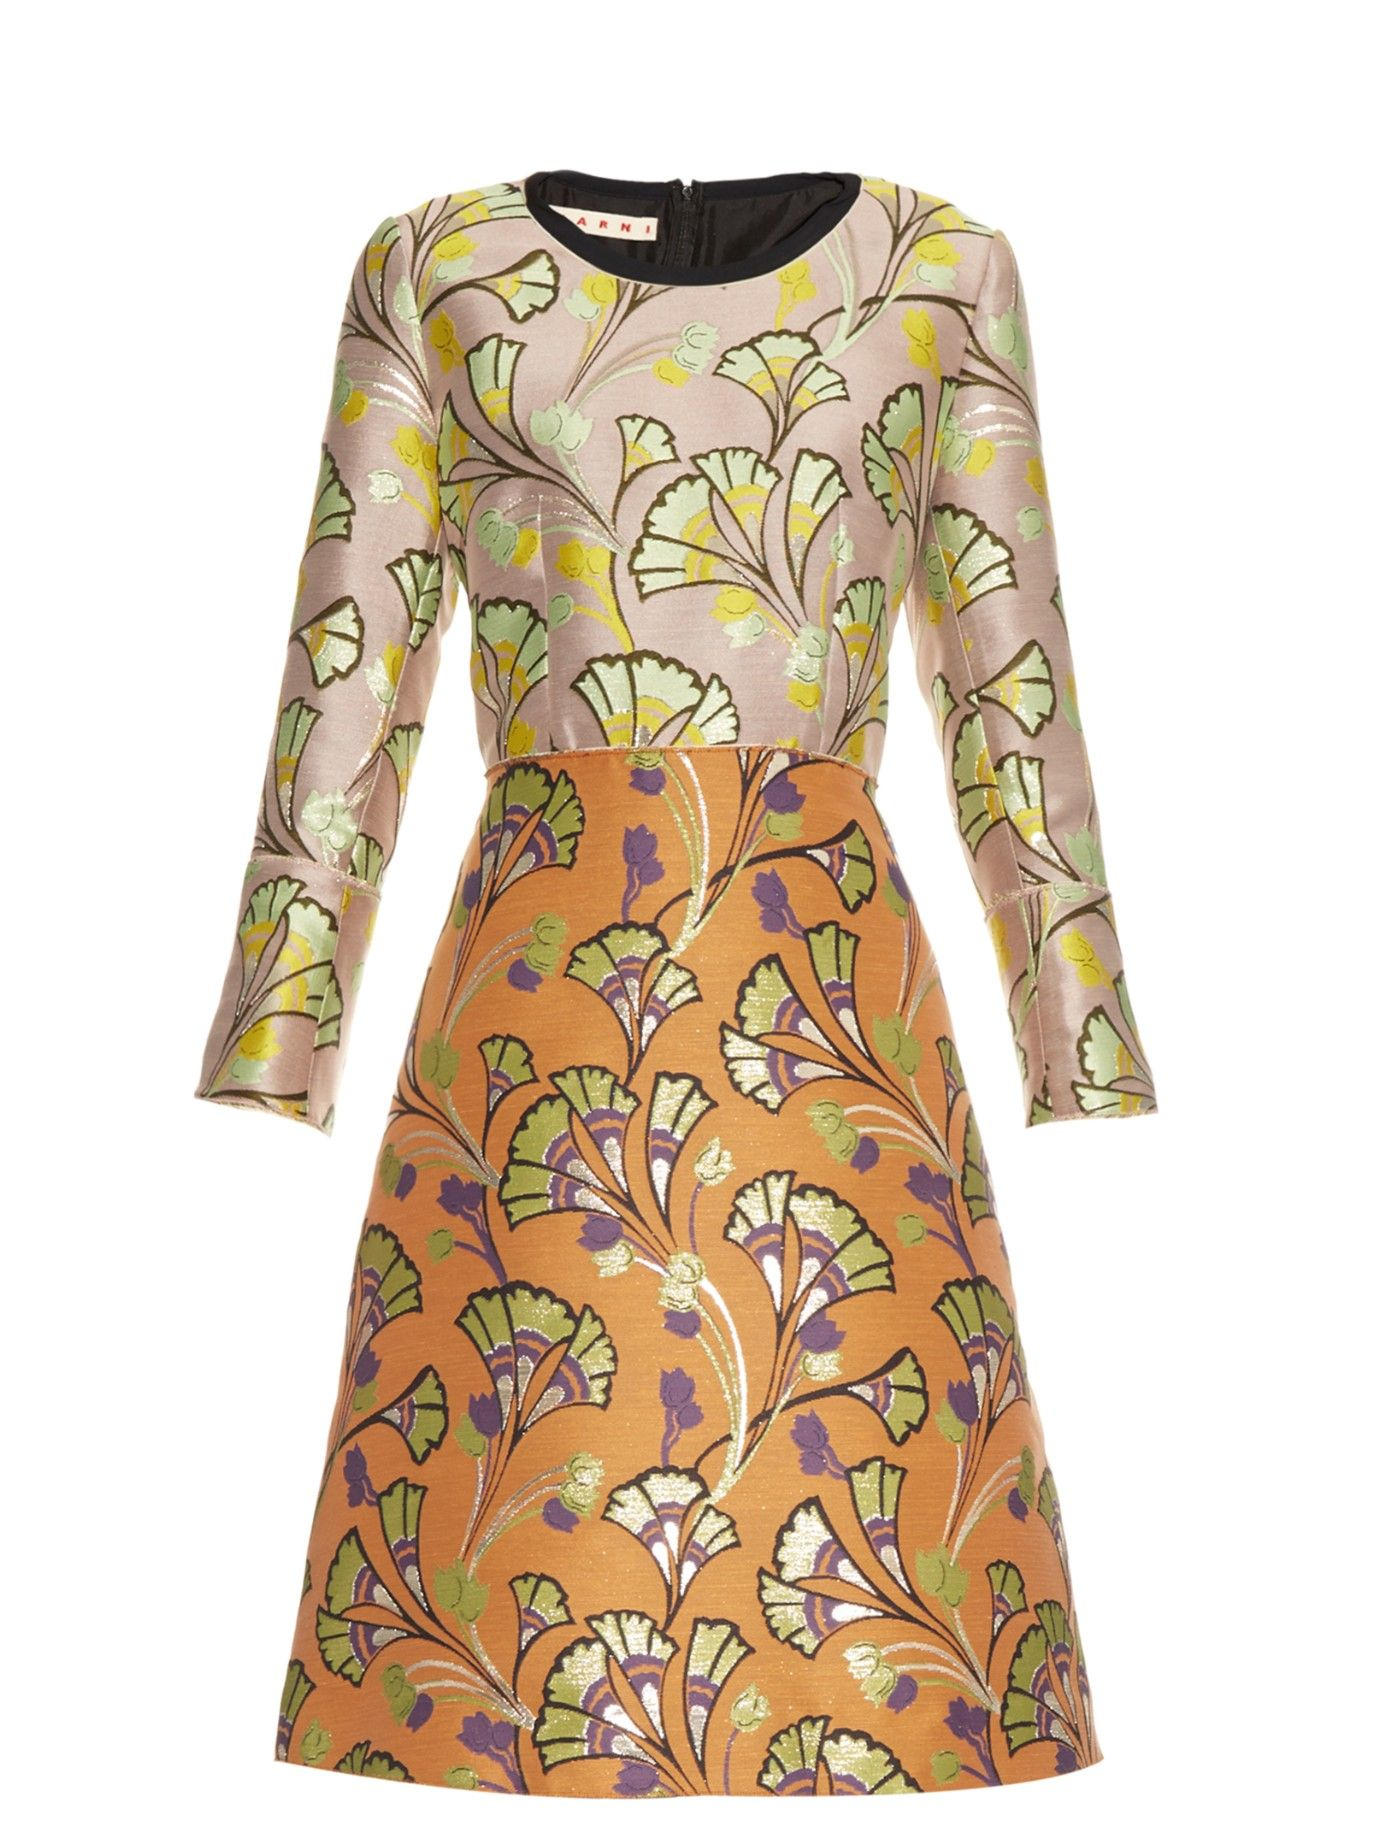 3 4 sleeve silk saree blouse designs floraljacquard aline dress  marni  matchesfashioncom us  moda